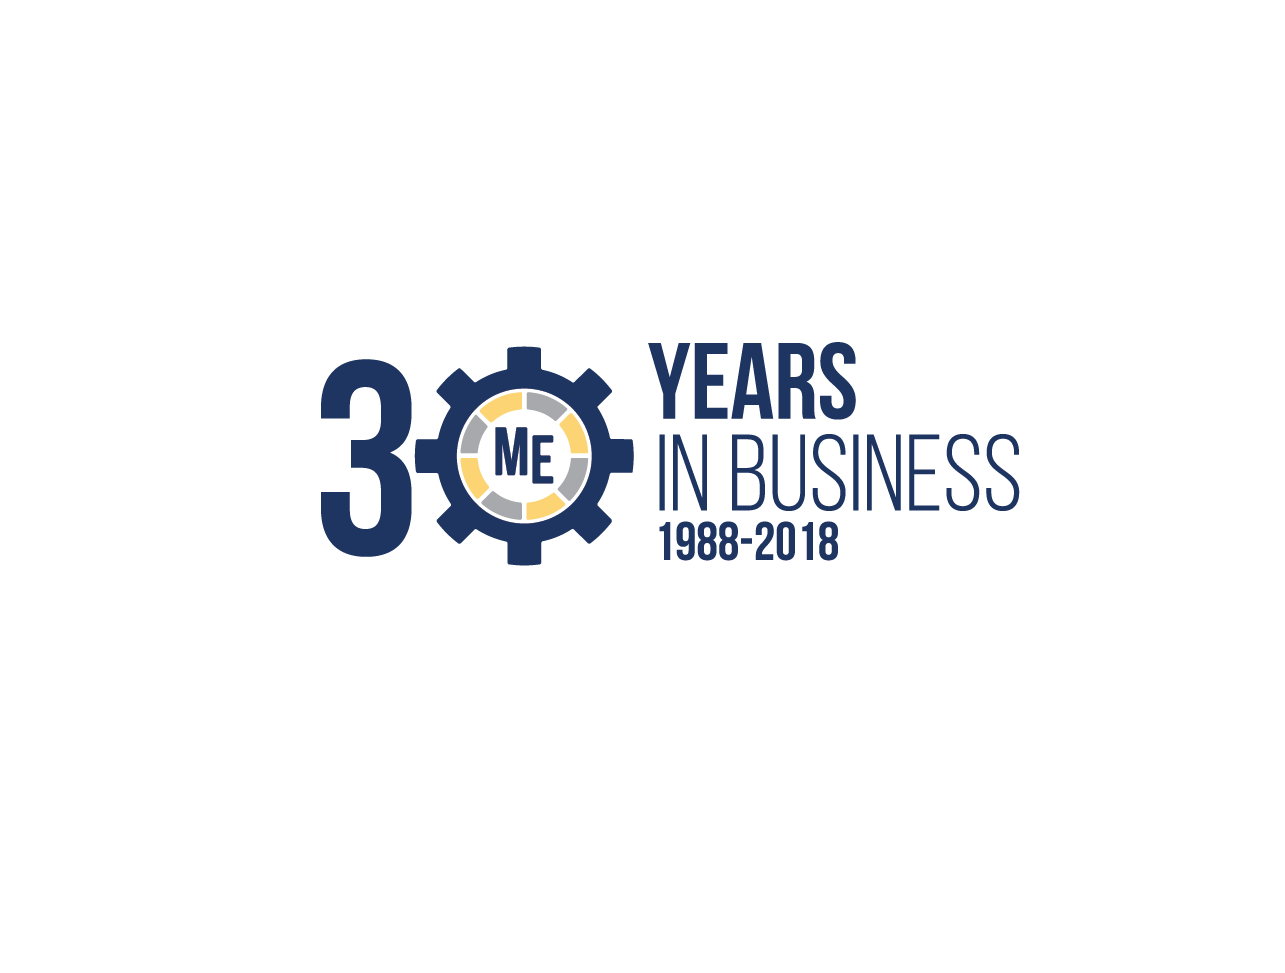 Elegant Playful Business Logo Design For Mobility Engineering In Australia 17470392